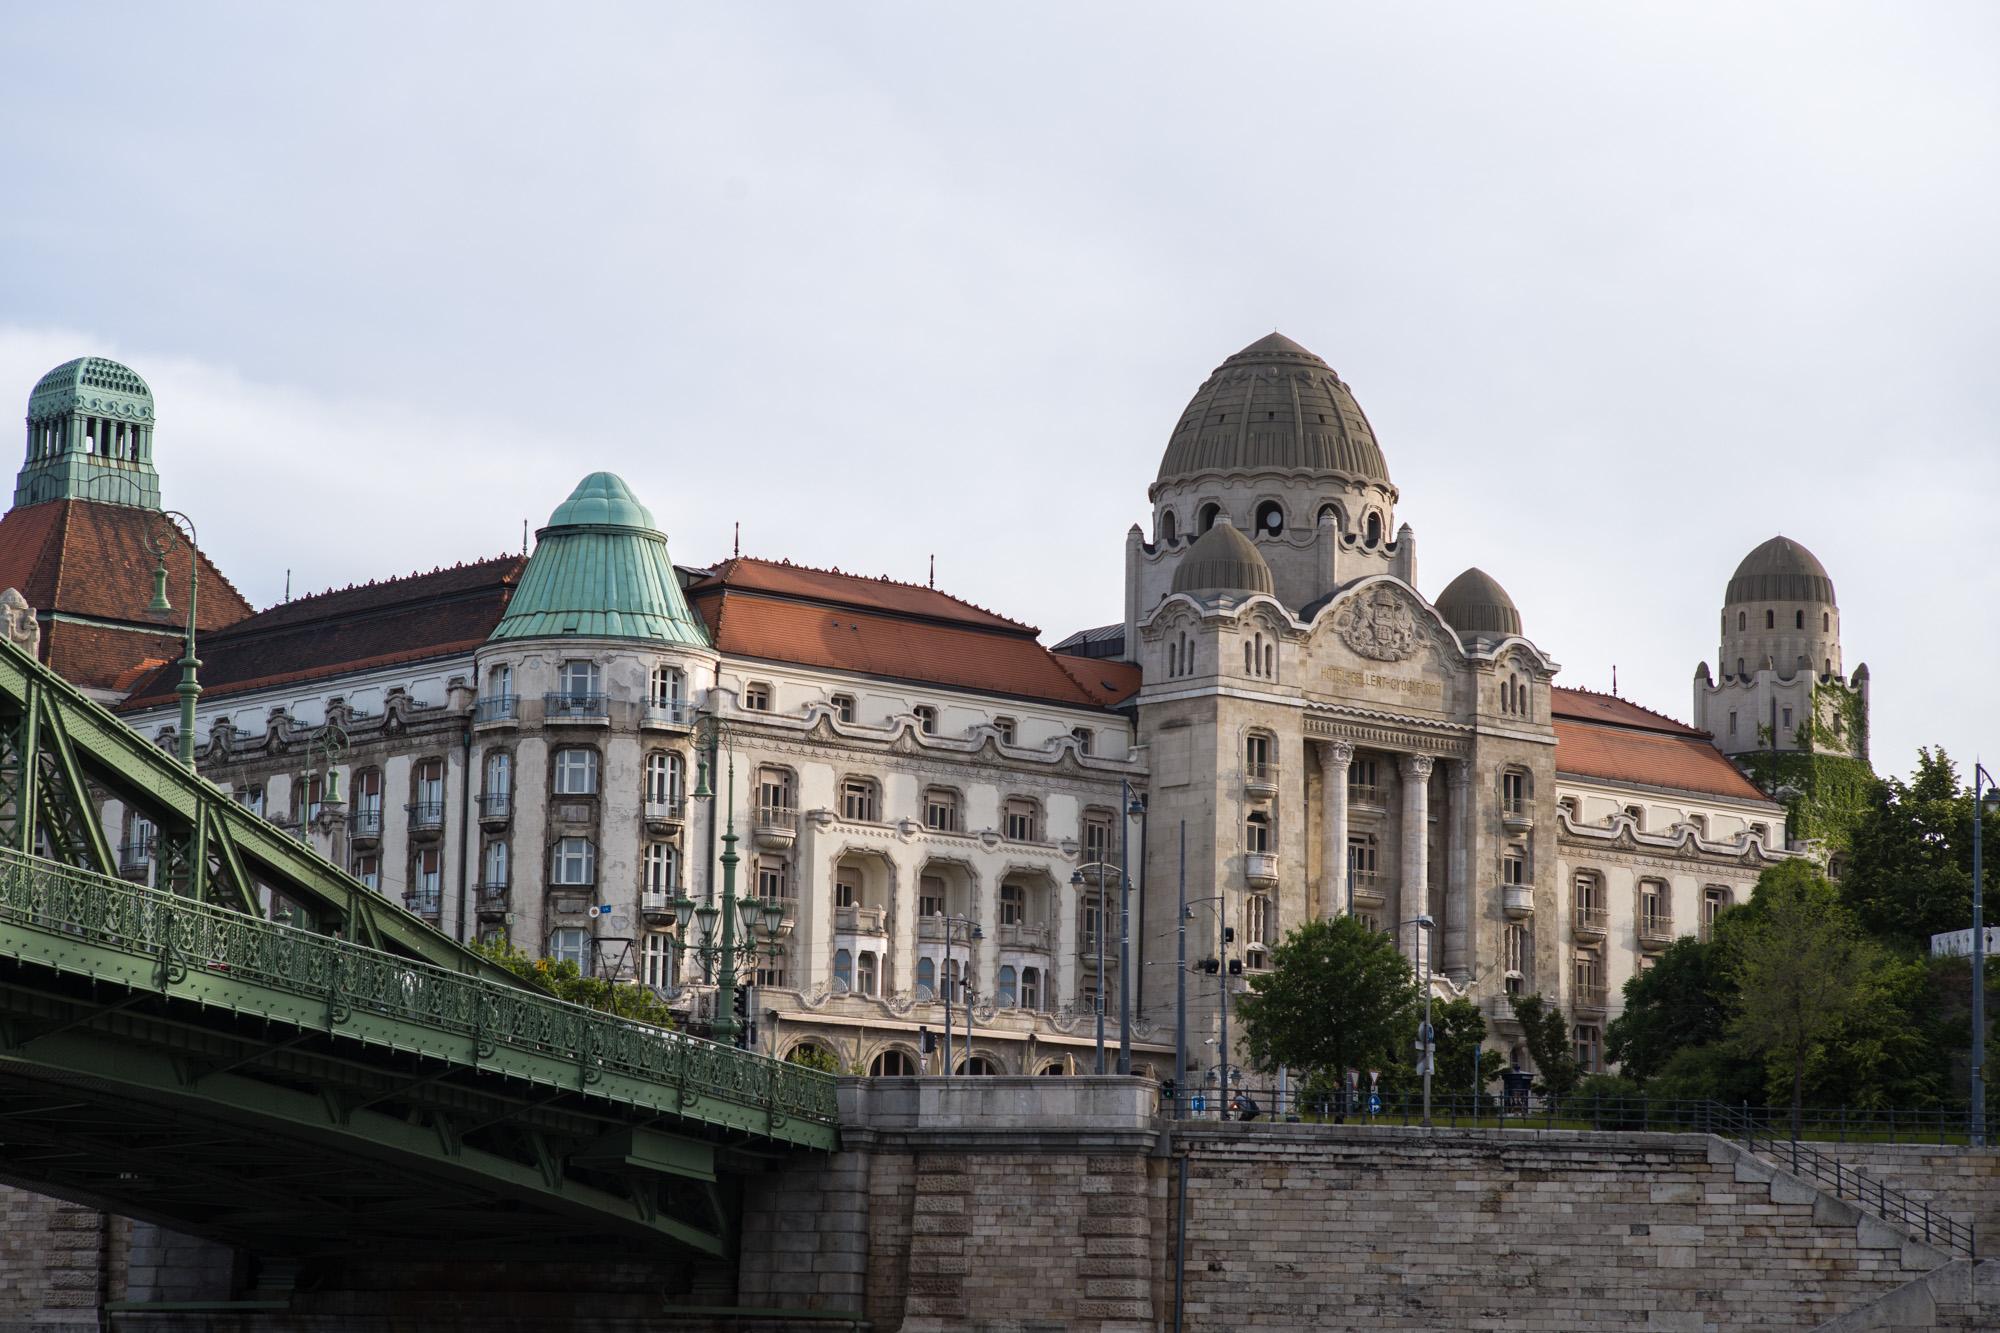 The Gellért Hotel and Baths